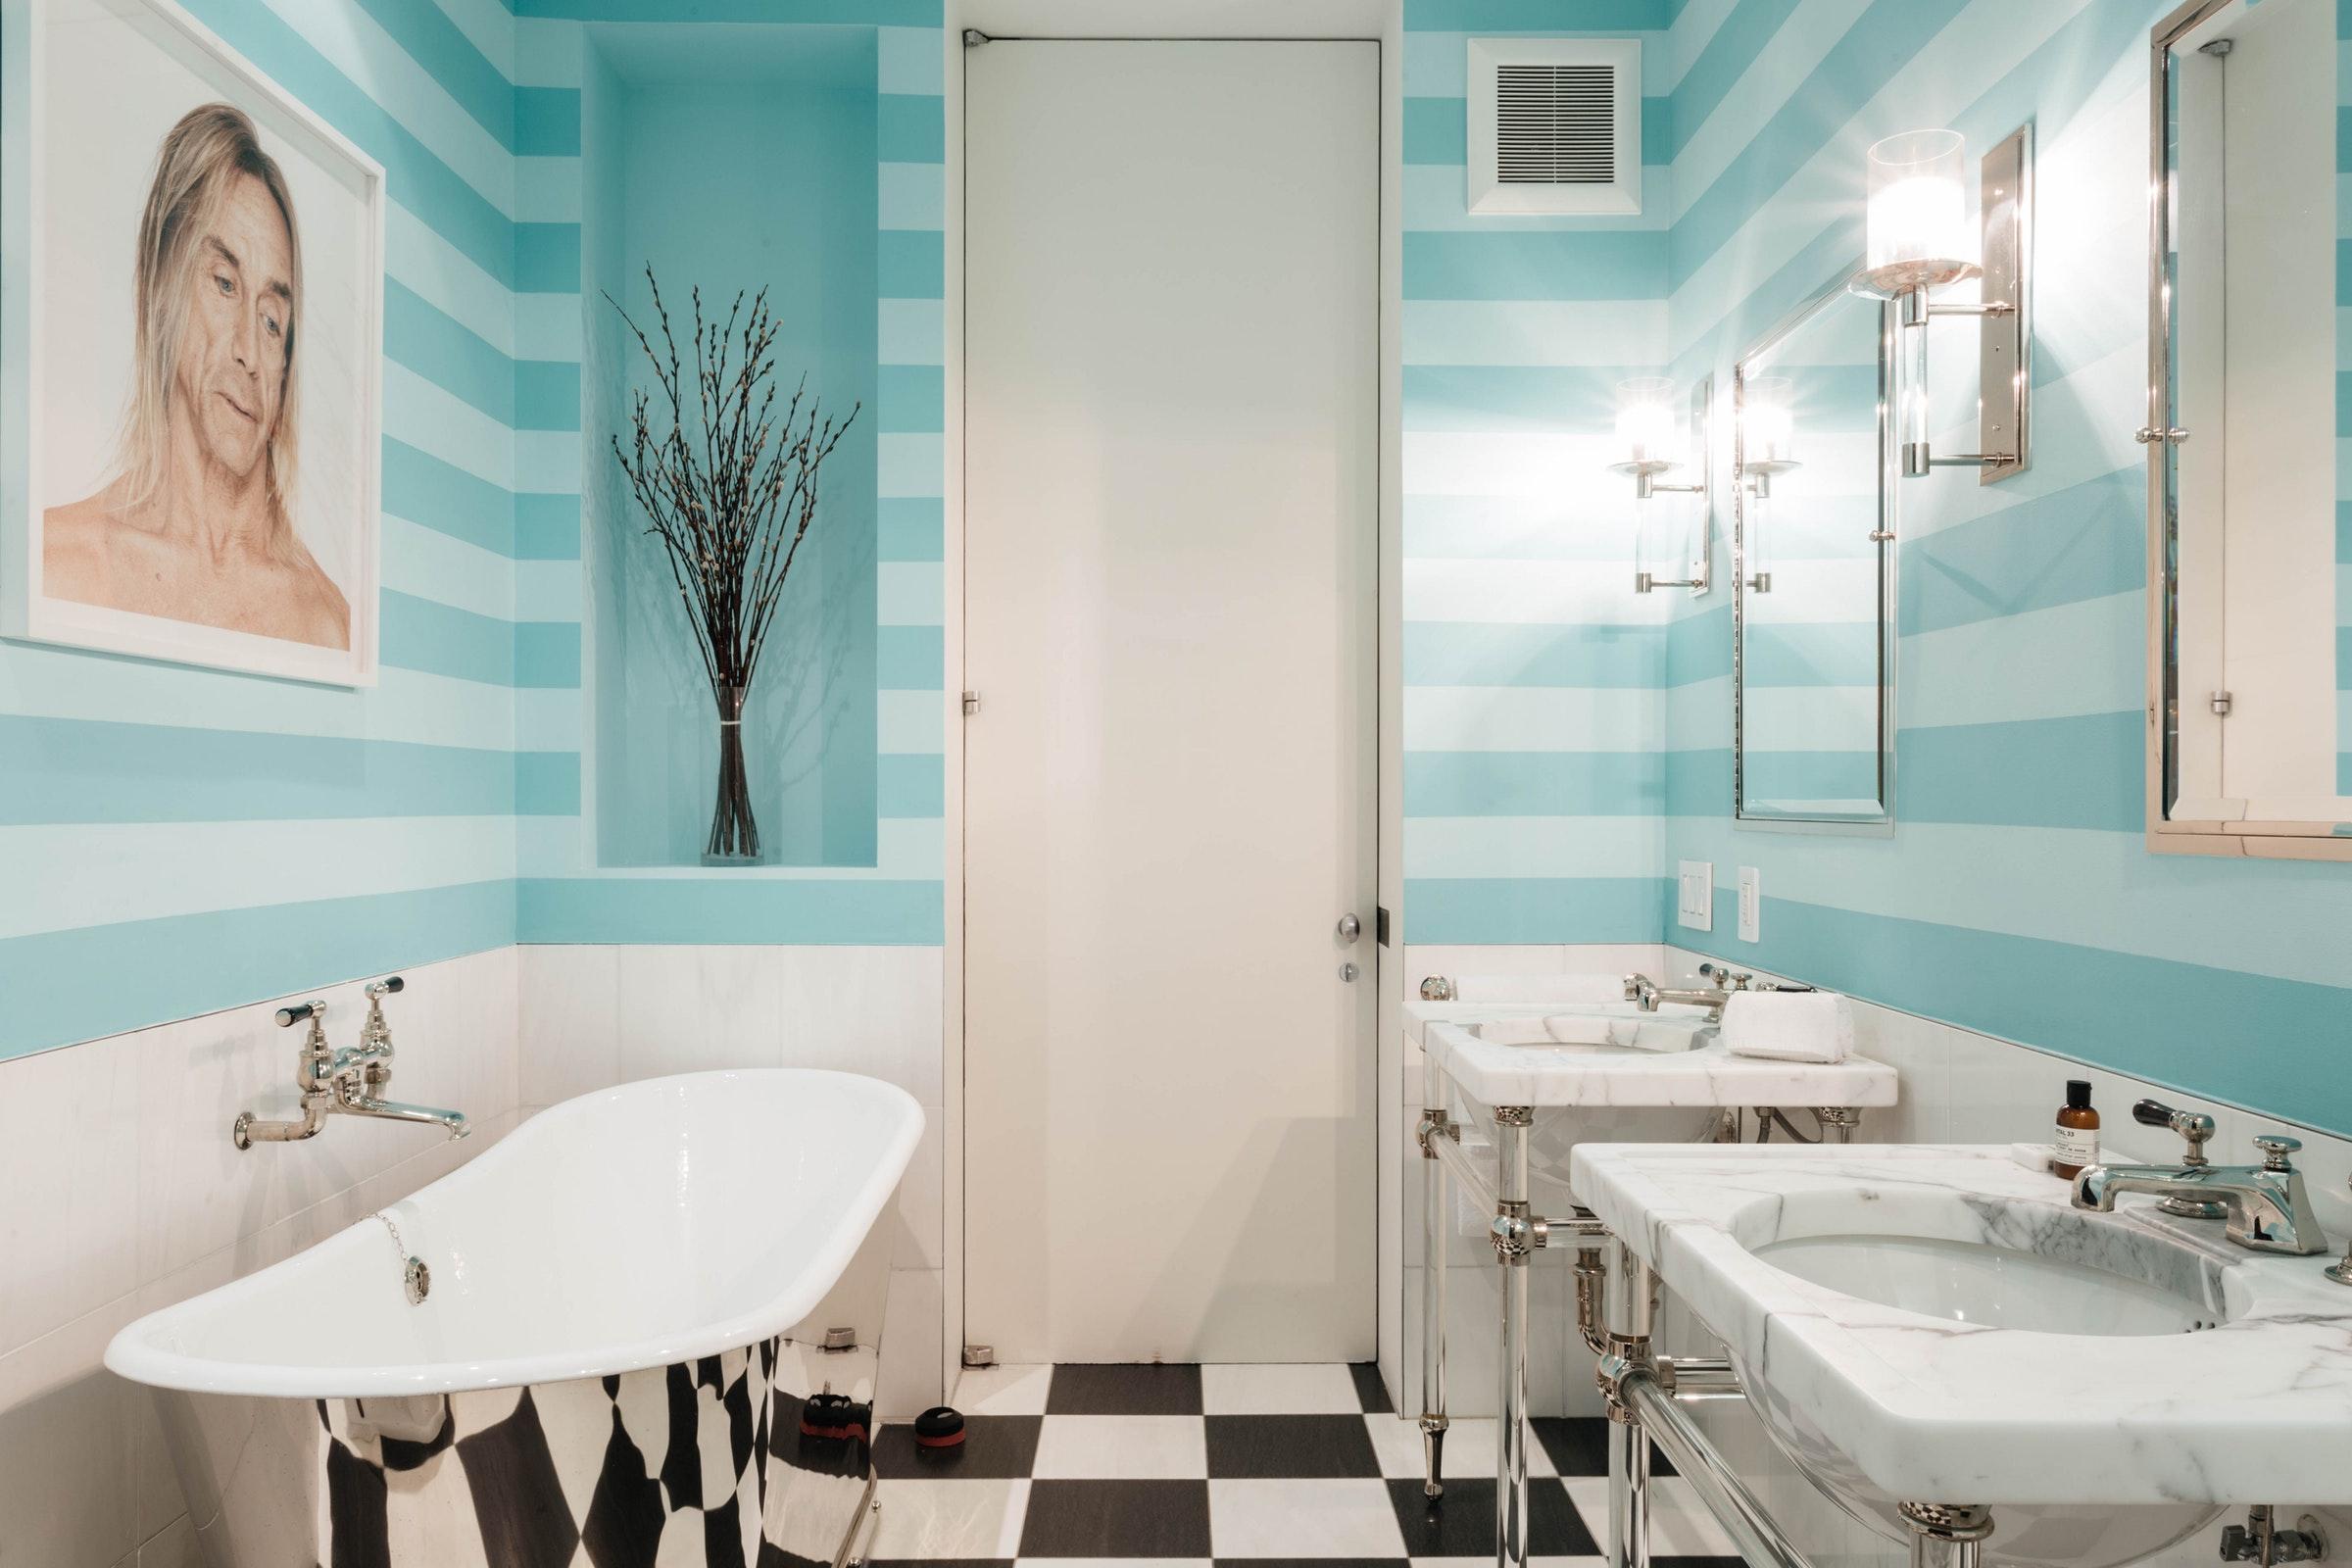 ванная комната раковина зеркало кран шахматная плитка настенные светильники